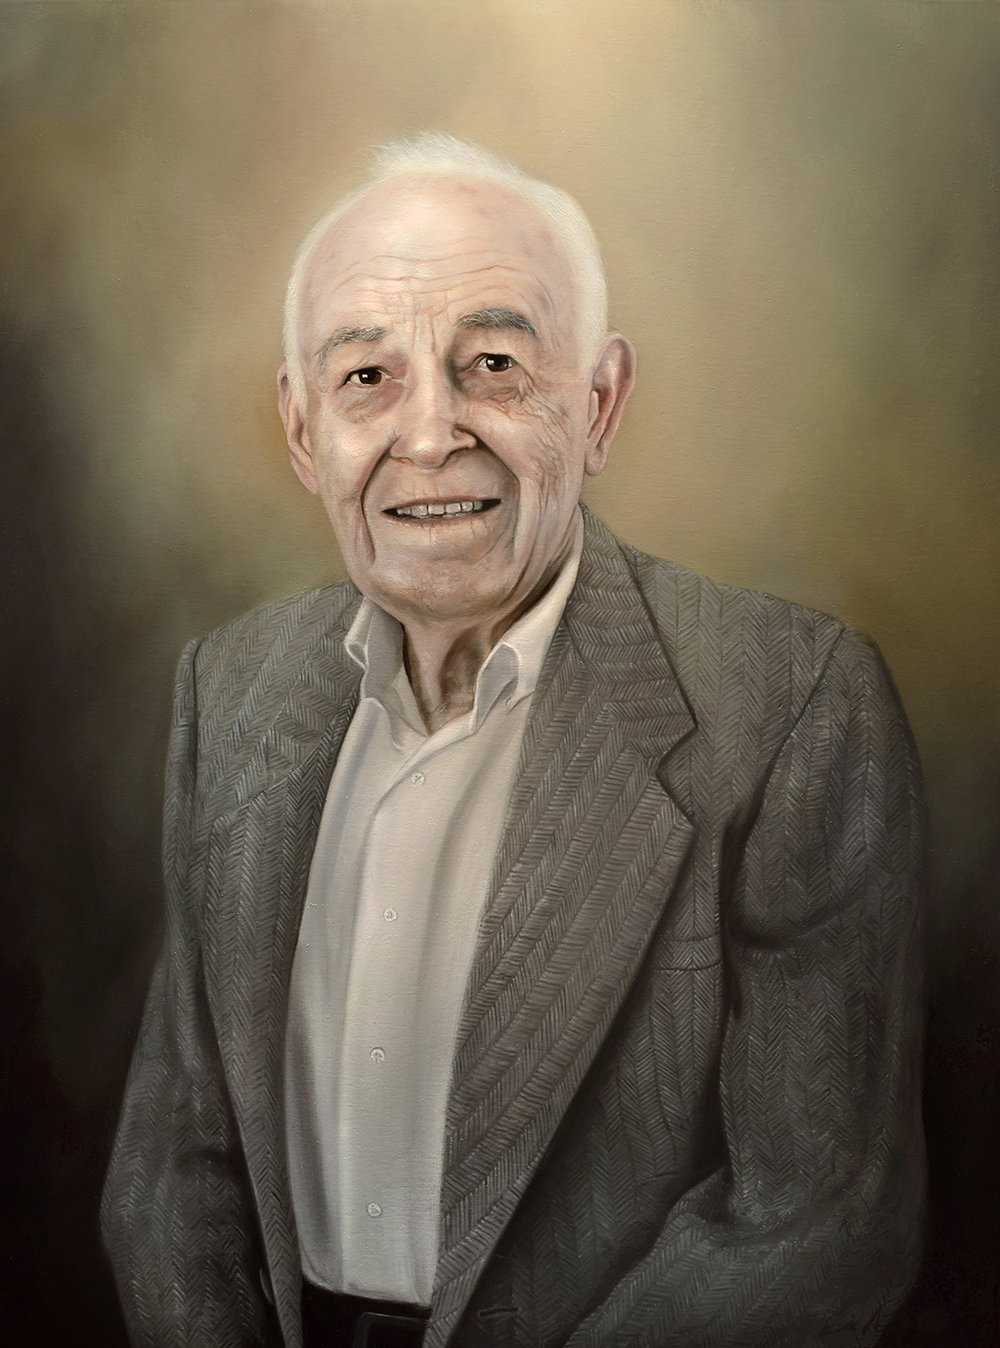 Portrait of philanthropist Rob Harrell